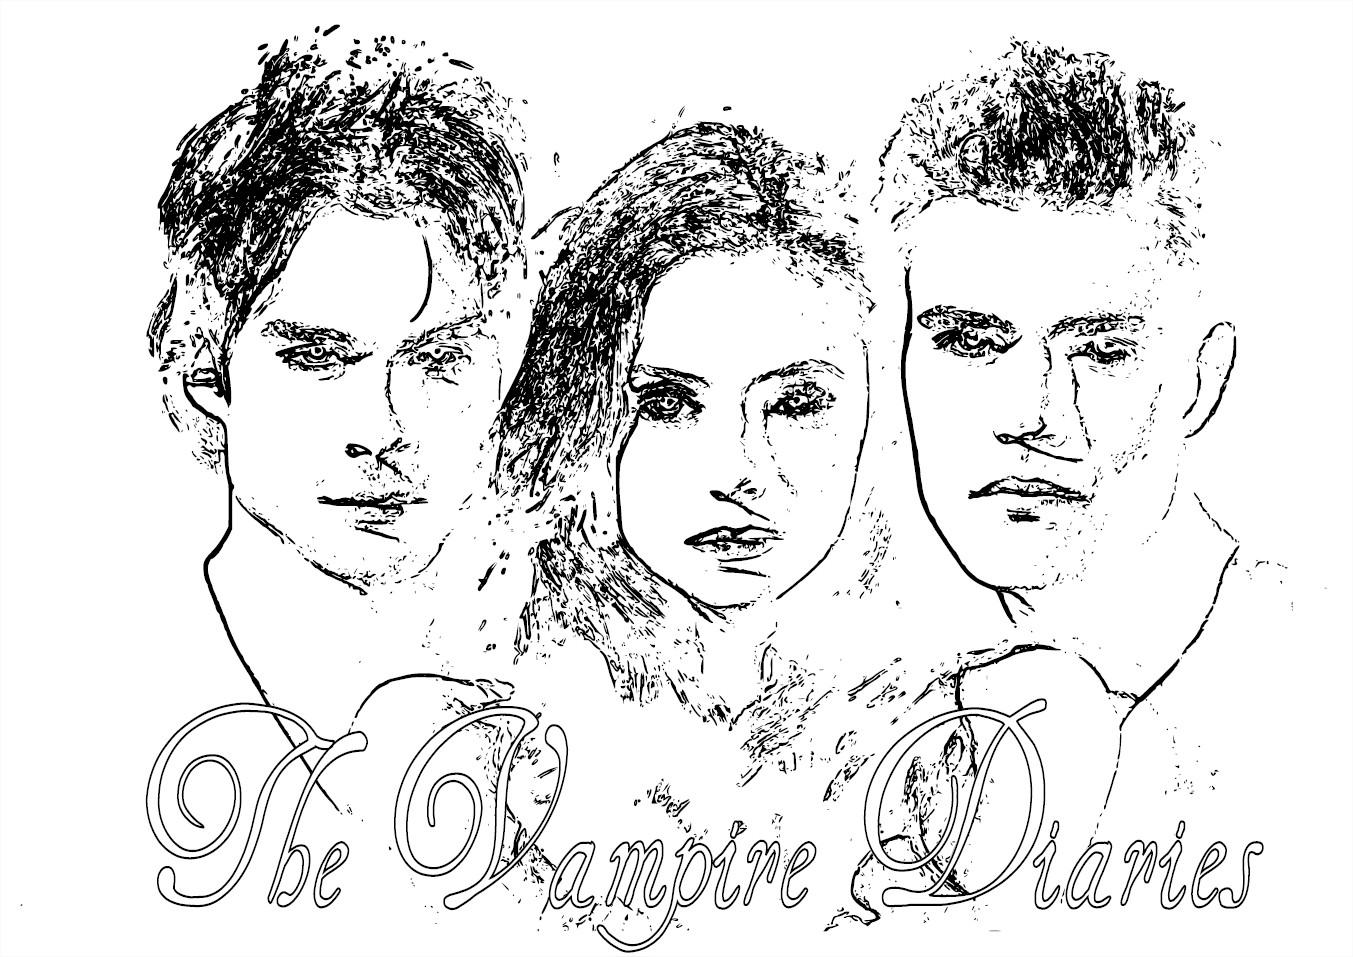 Vampire Diaries : Coloriage de la série The Vampire